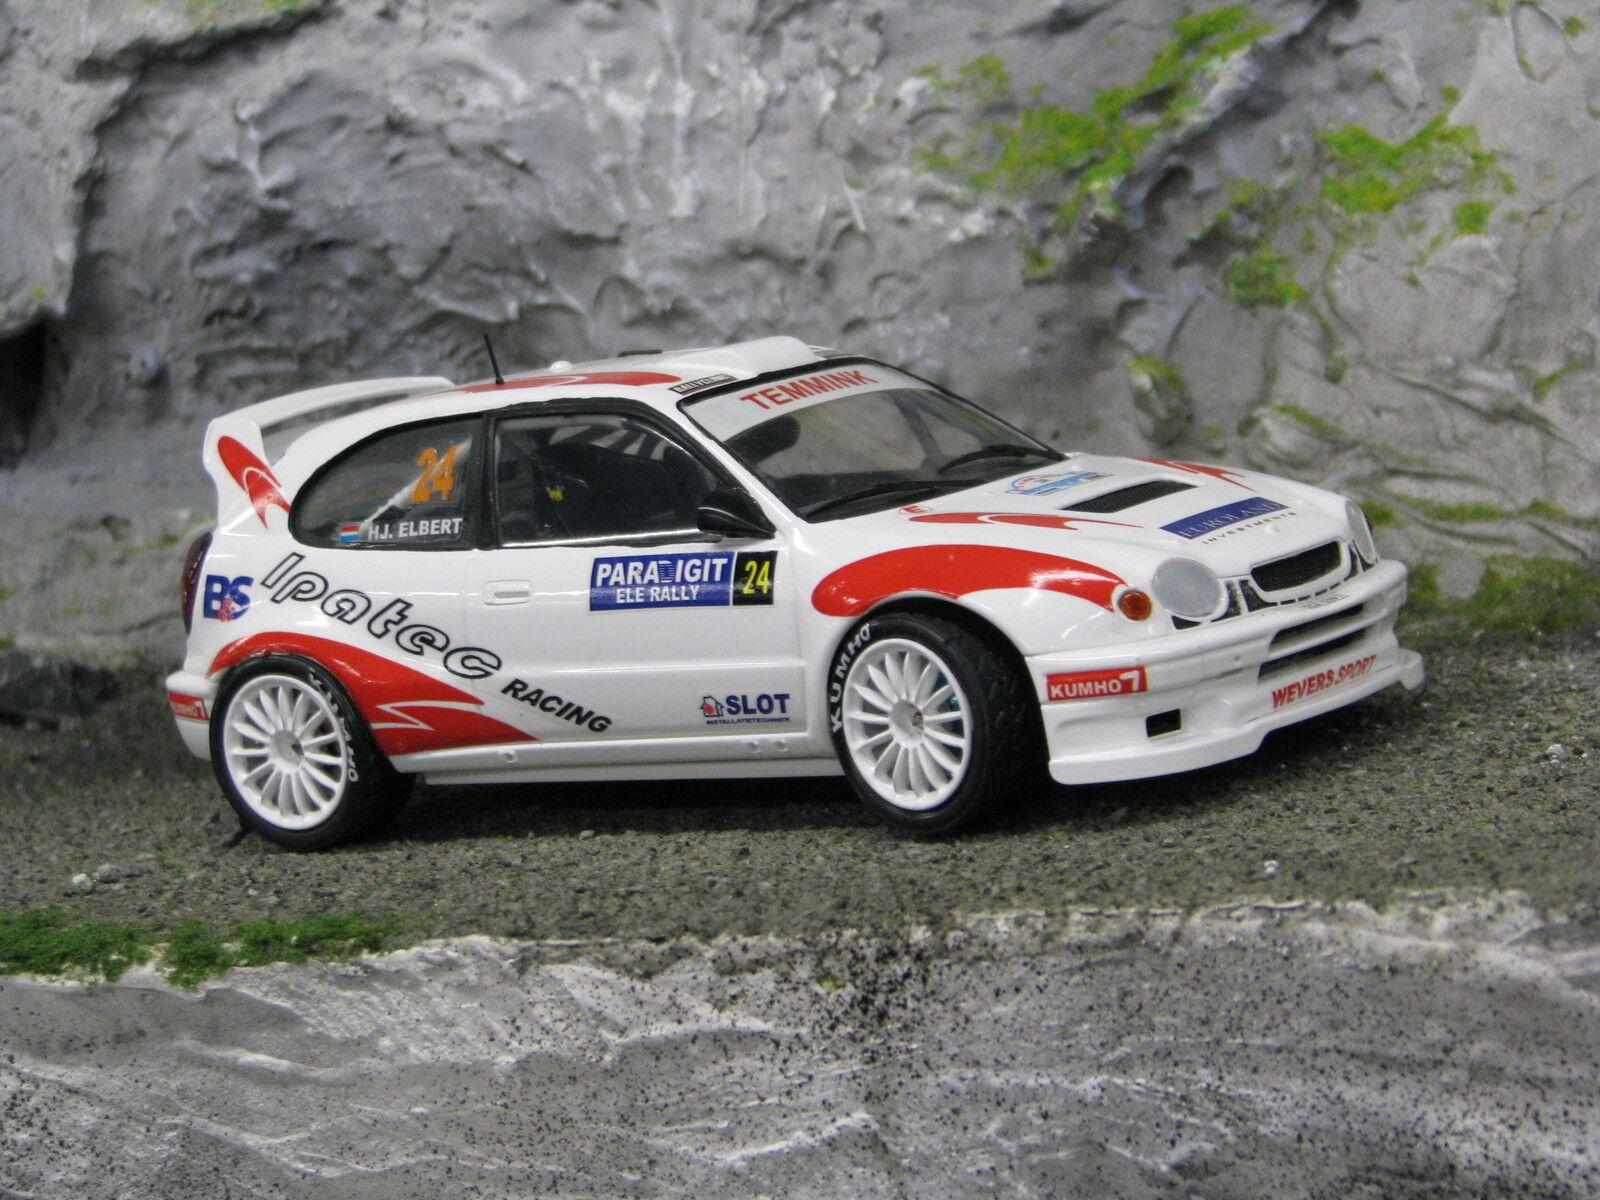 QSP Toyota Corlla WRC 1 24  24 Temmink   Elbert Paradigit ELE Rally 2007